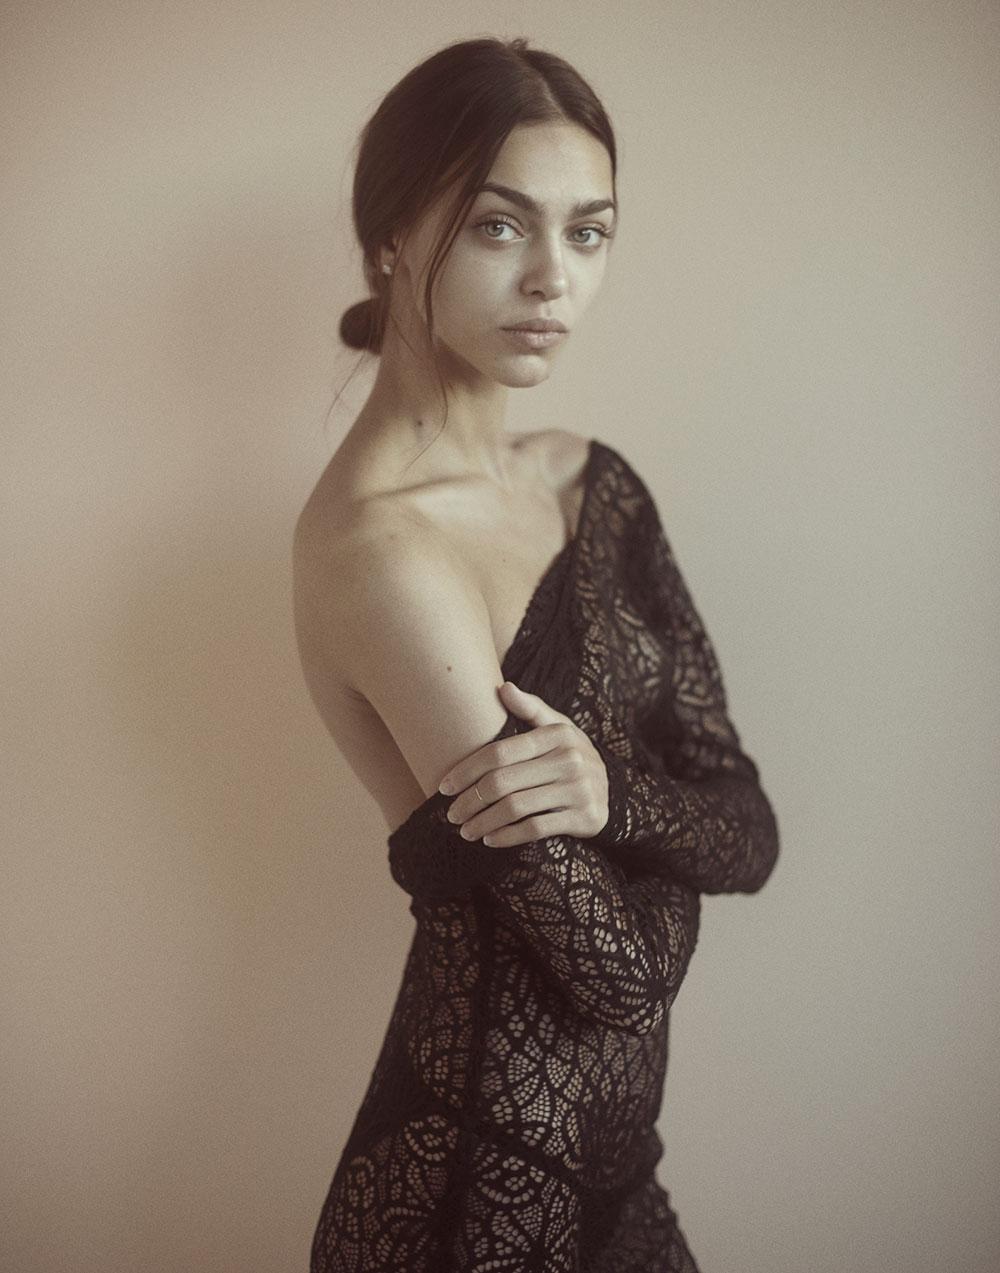 Photo of Zhenya Katava for Casting room by Ryan Michael Kelly